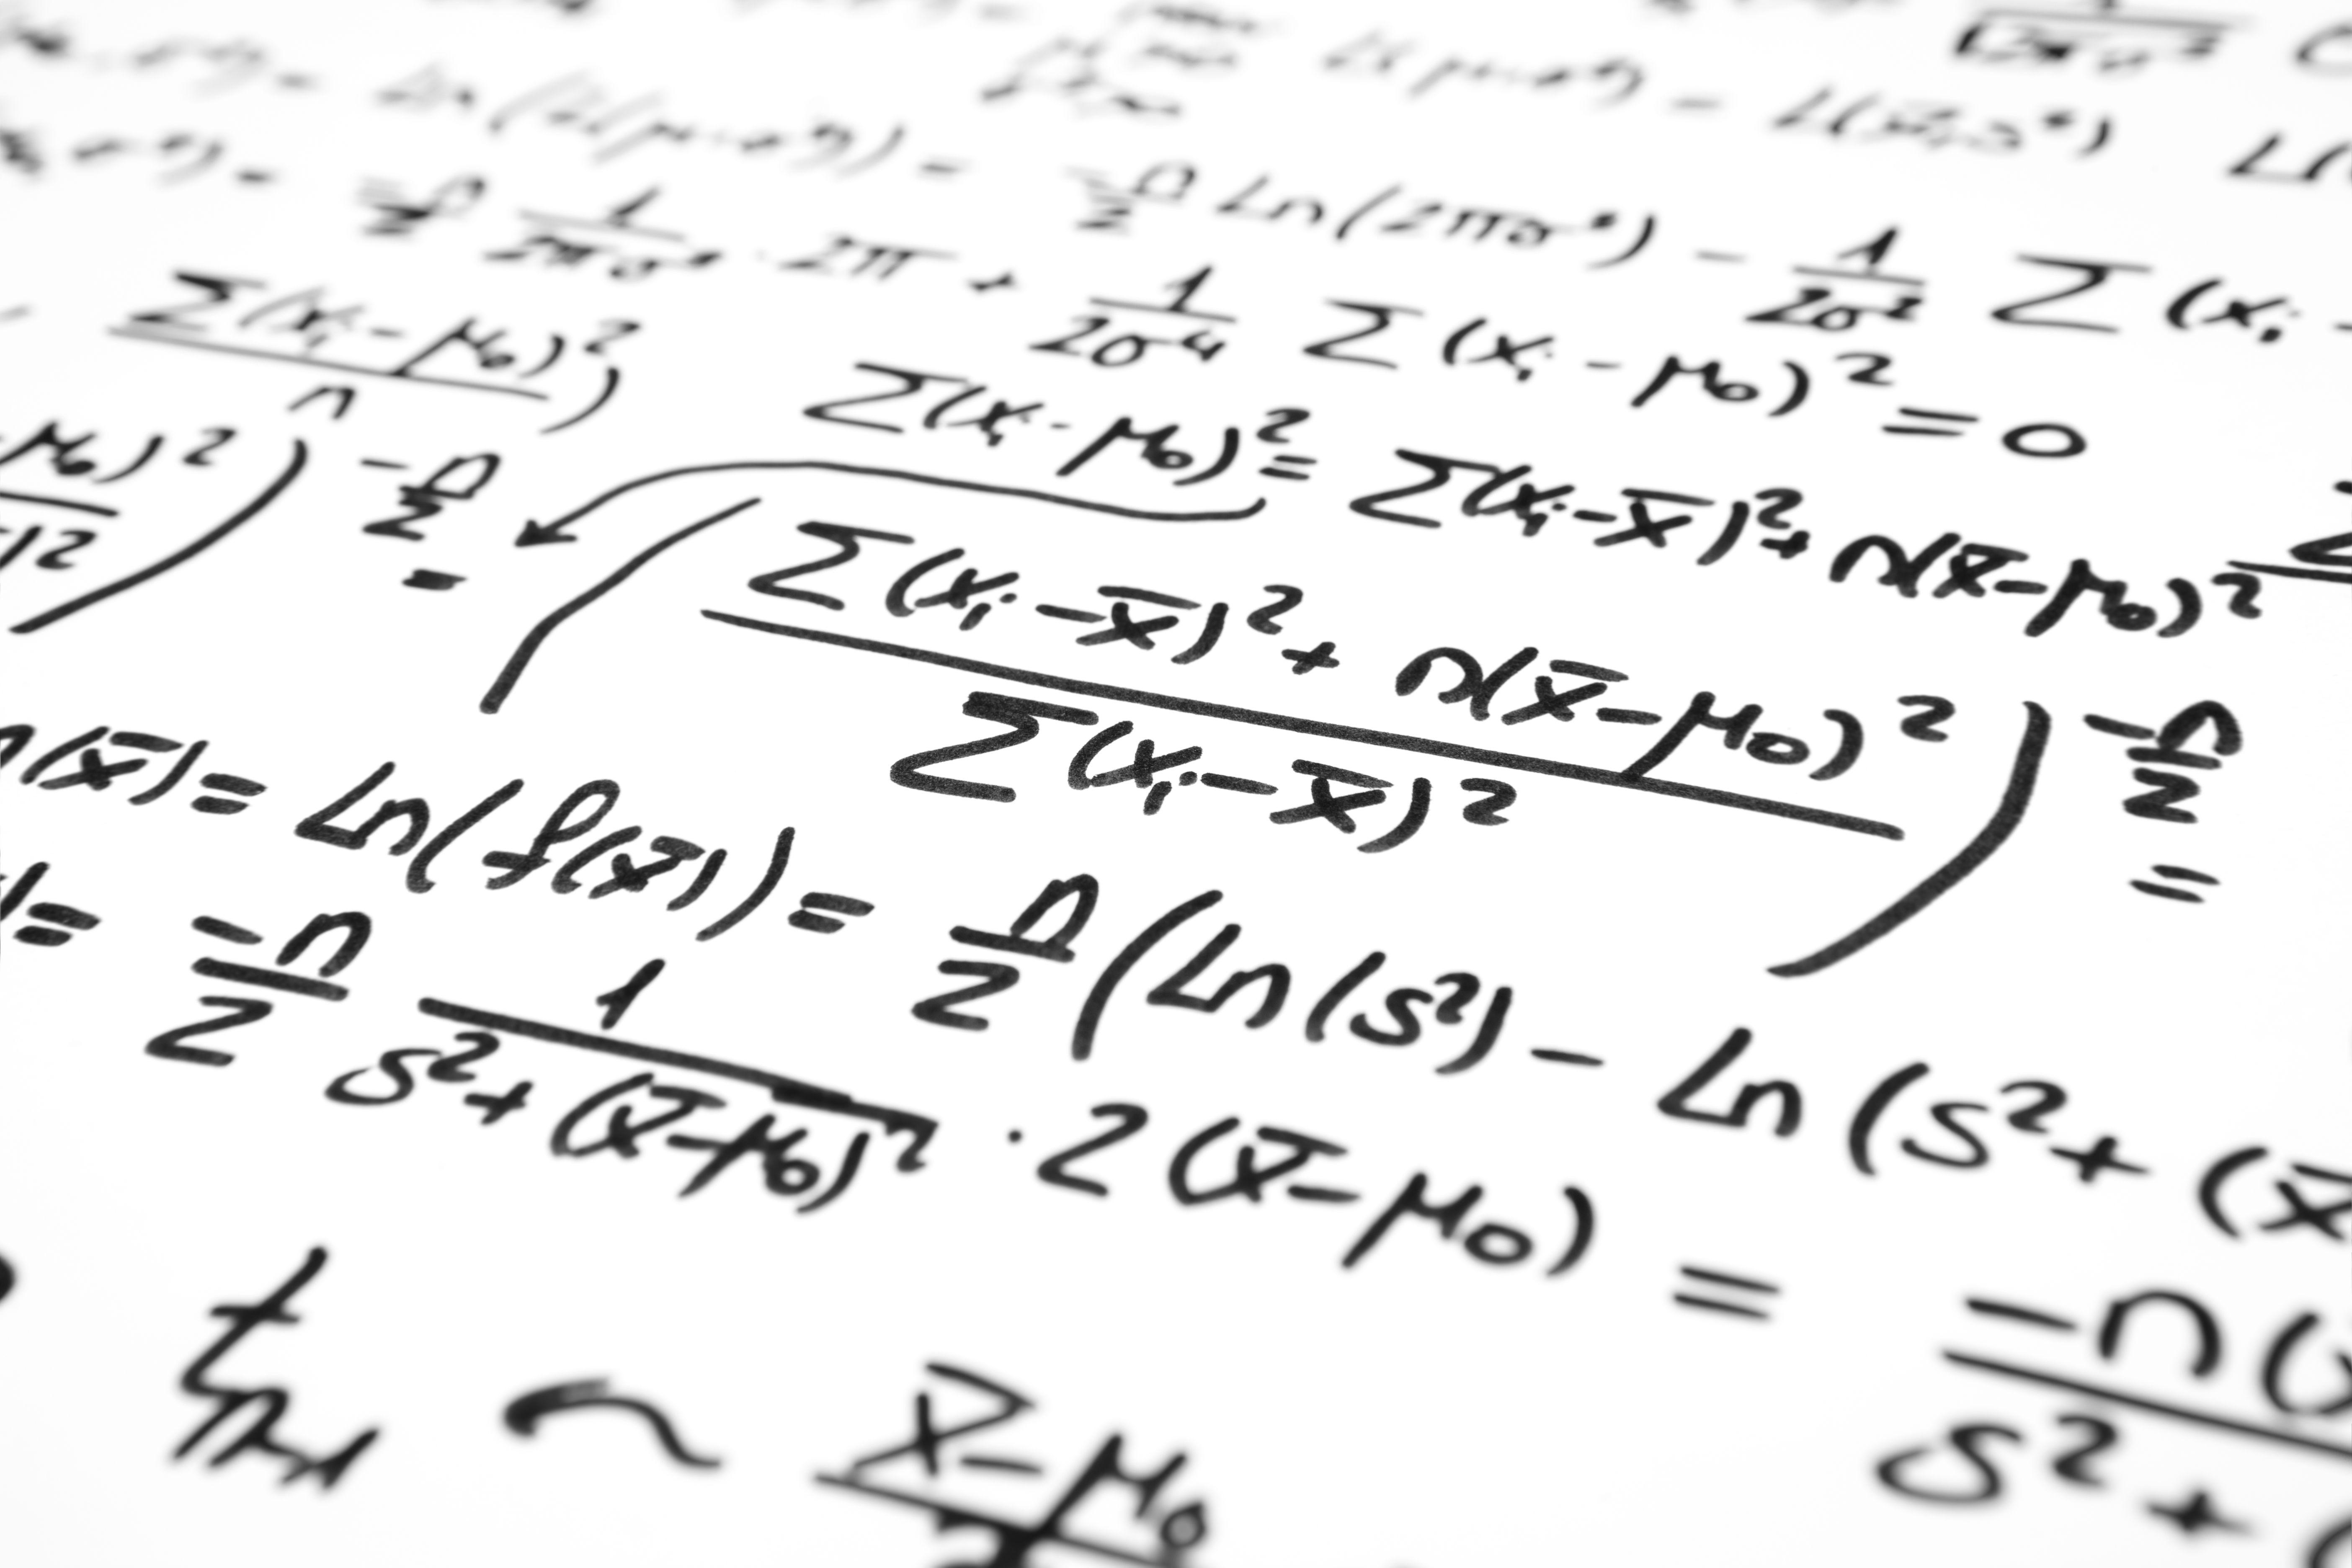 Electron Configuration Test Questions